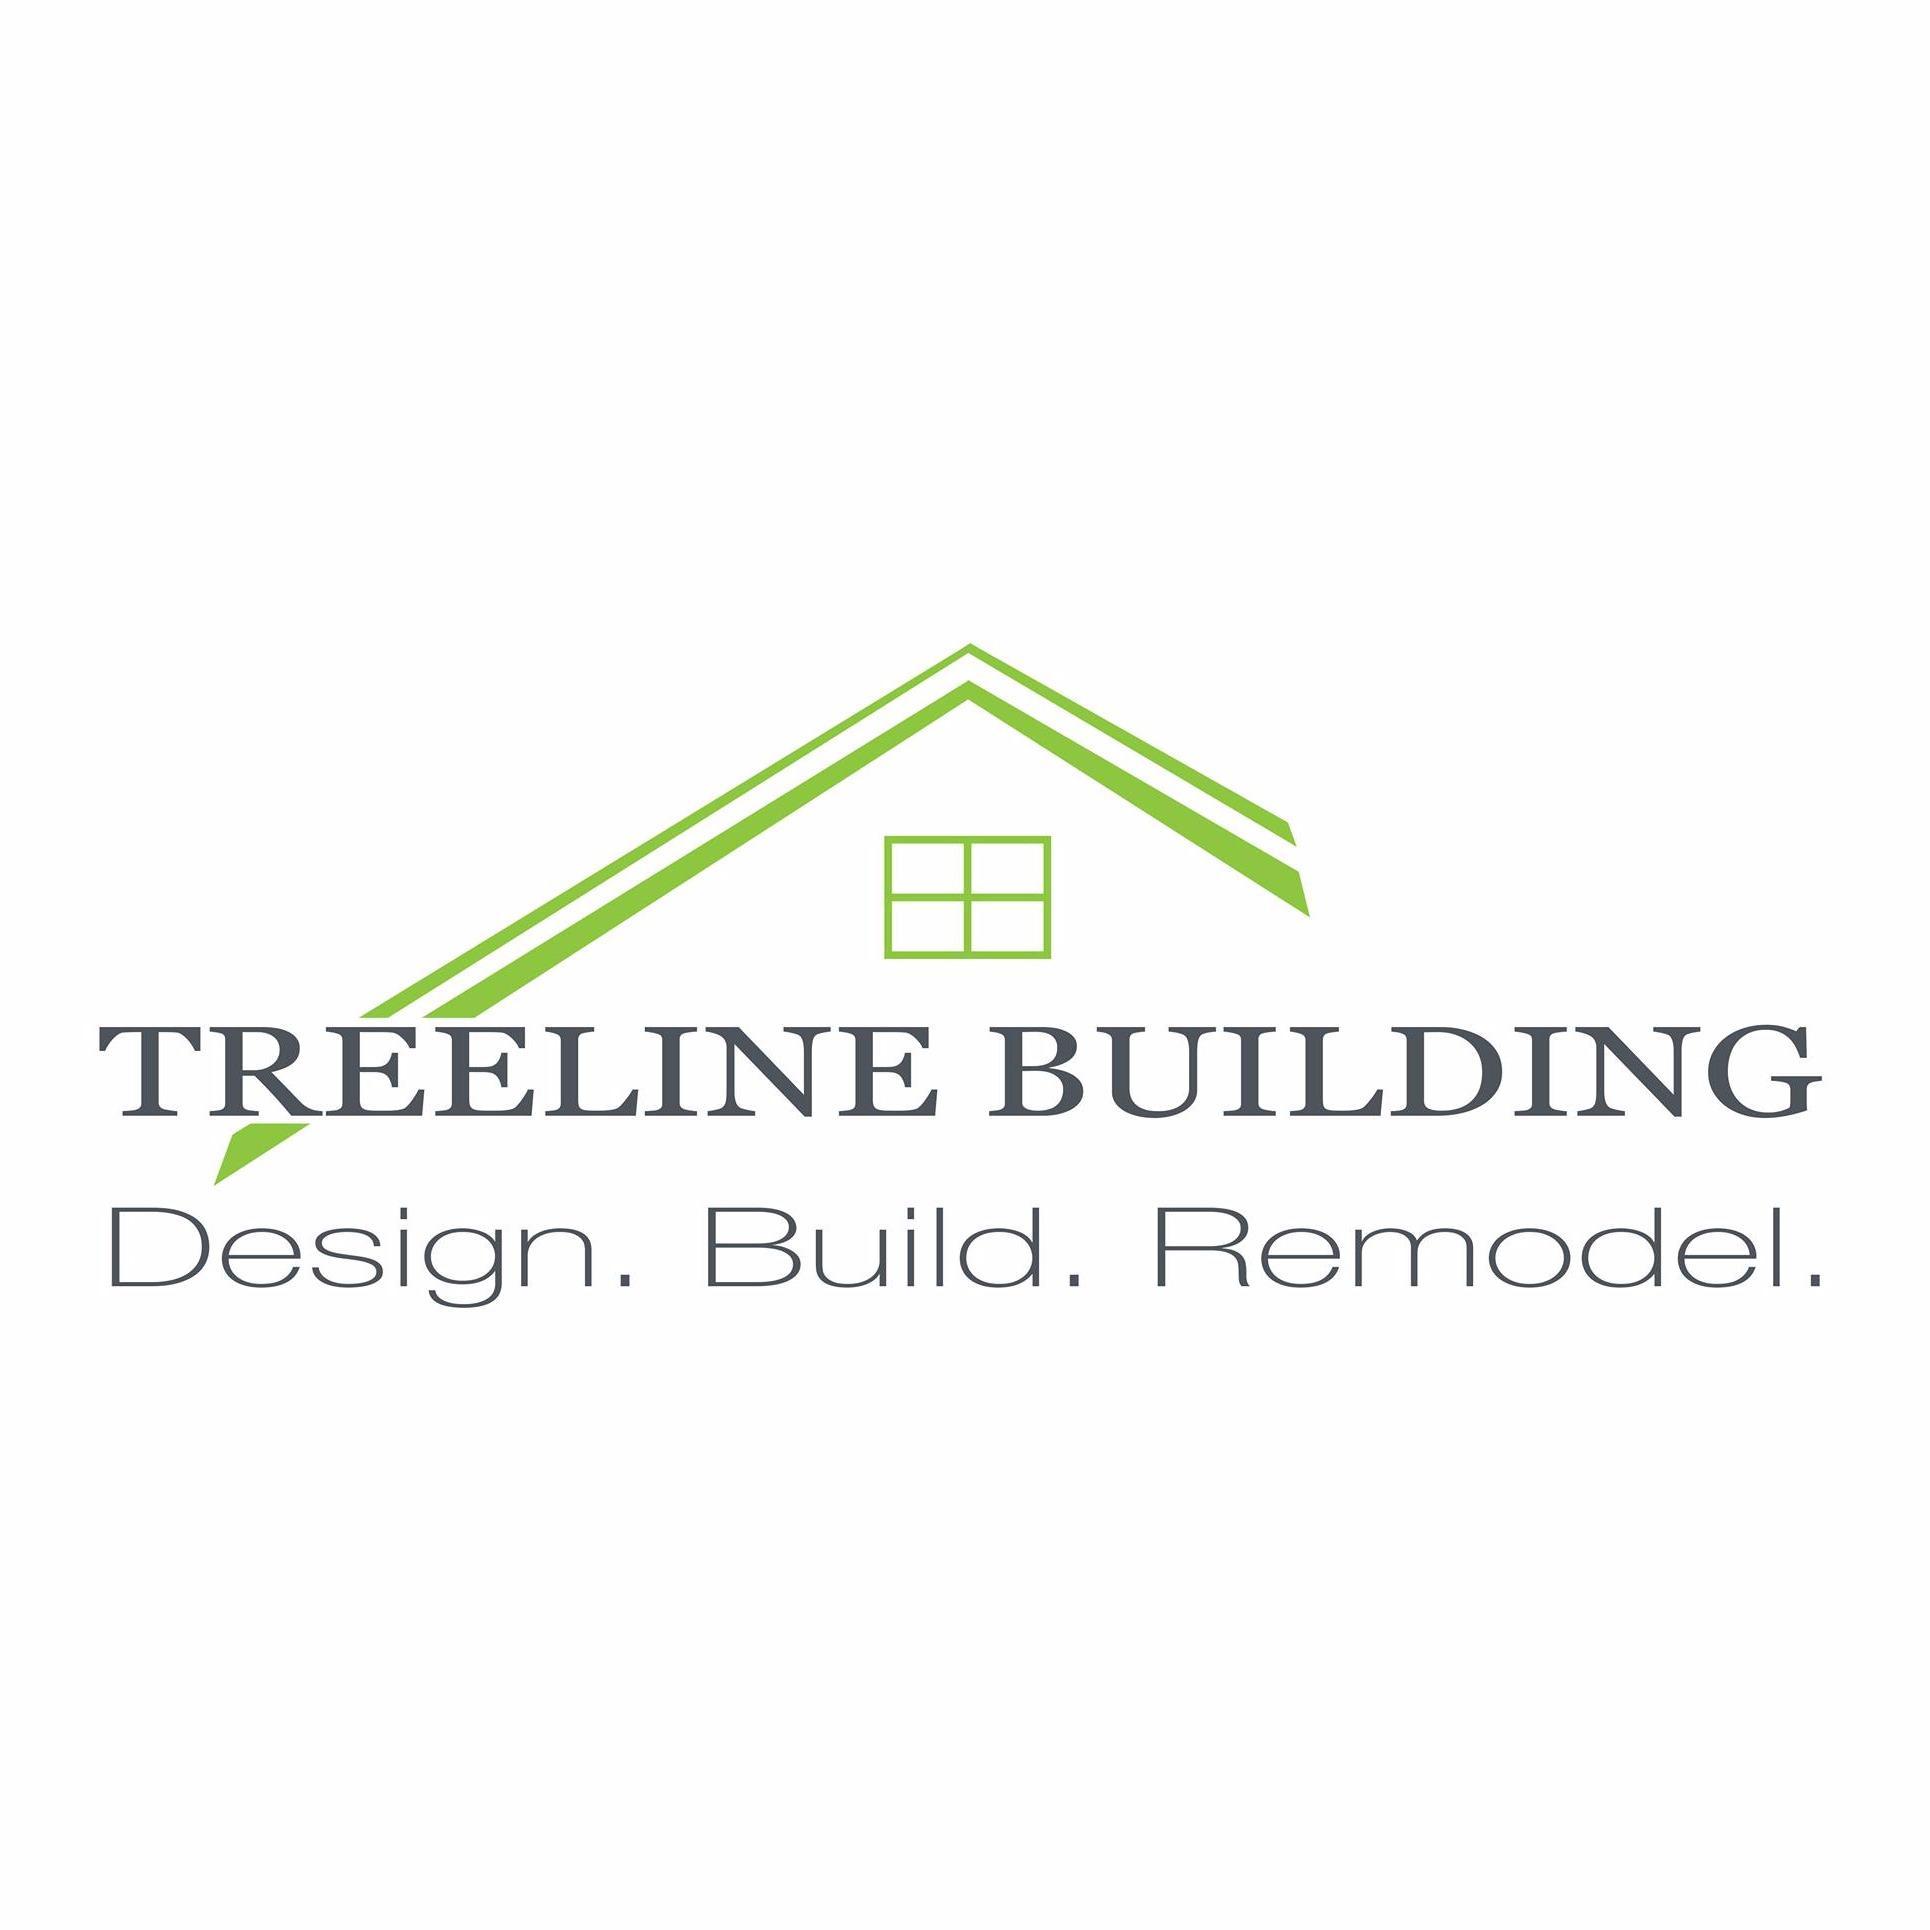 Treeline Building